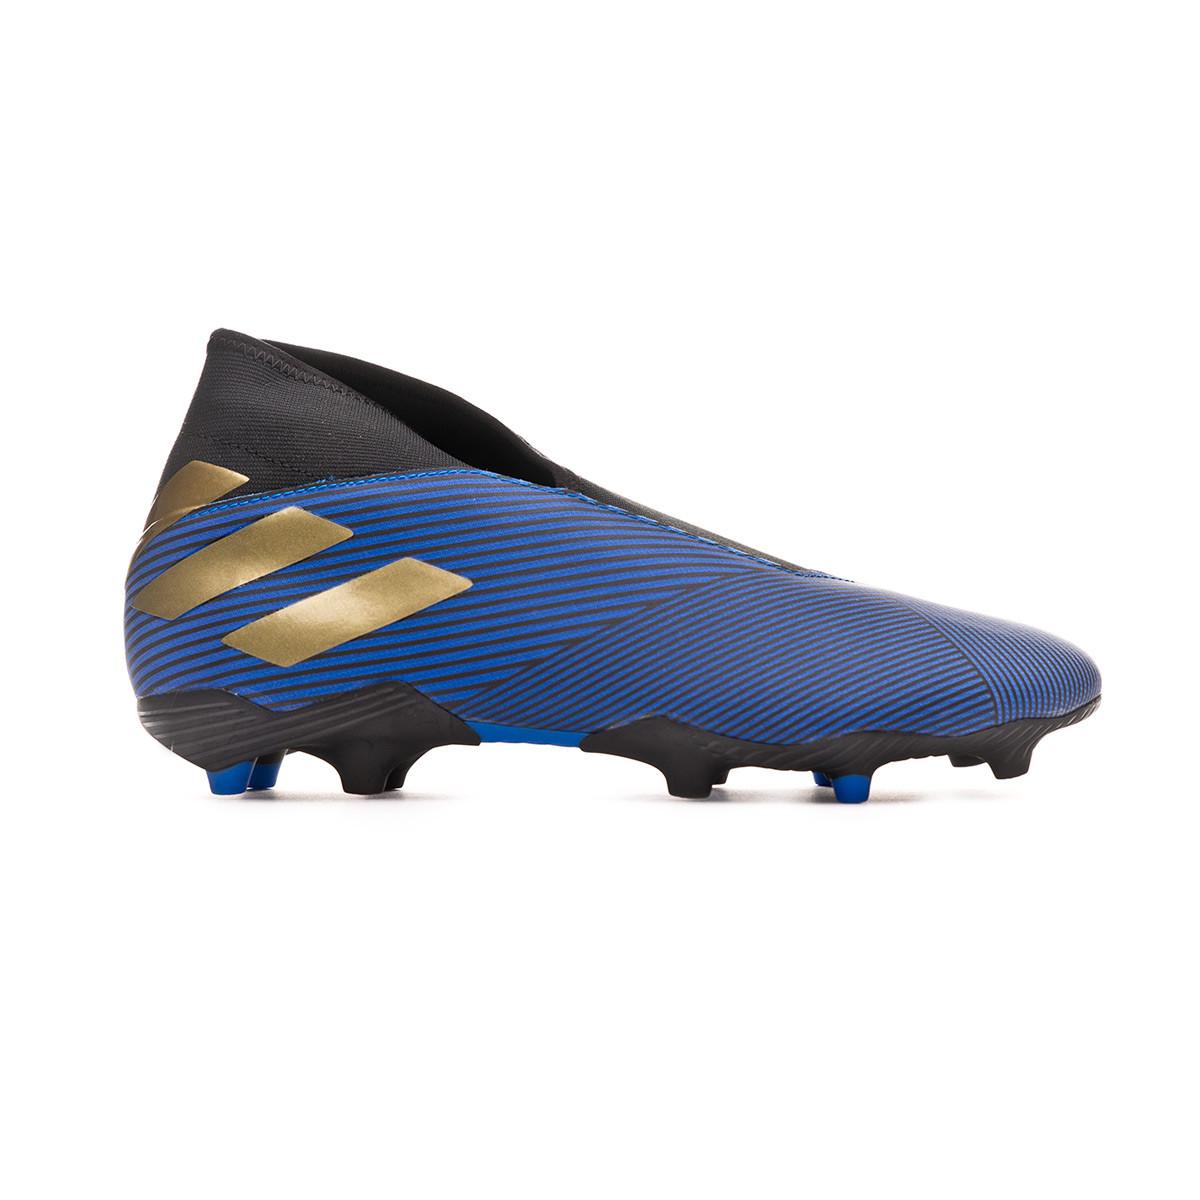 adidas laceless football boots size 3